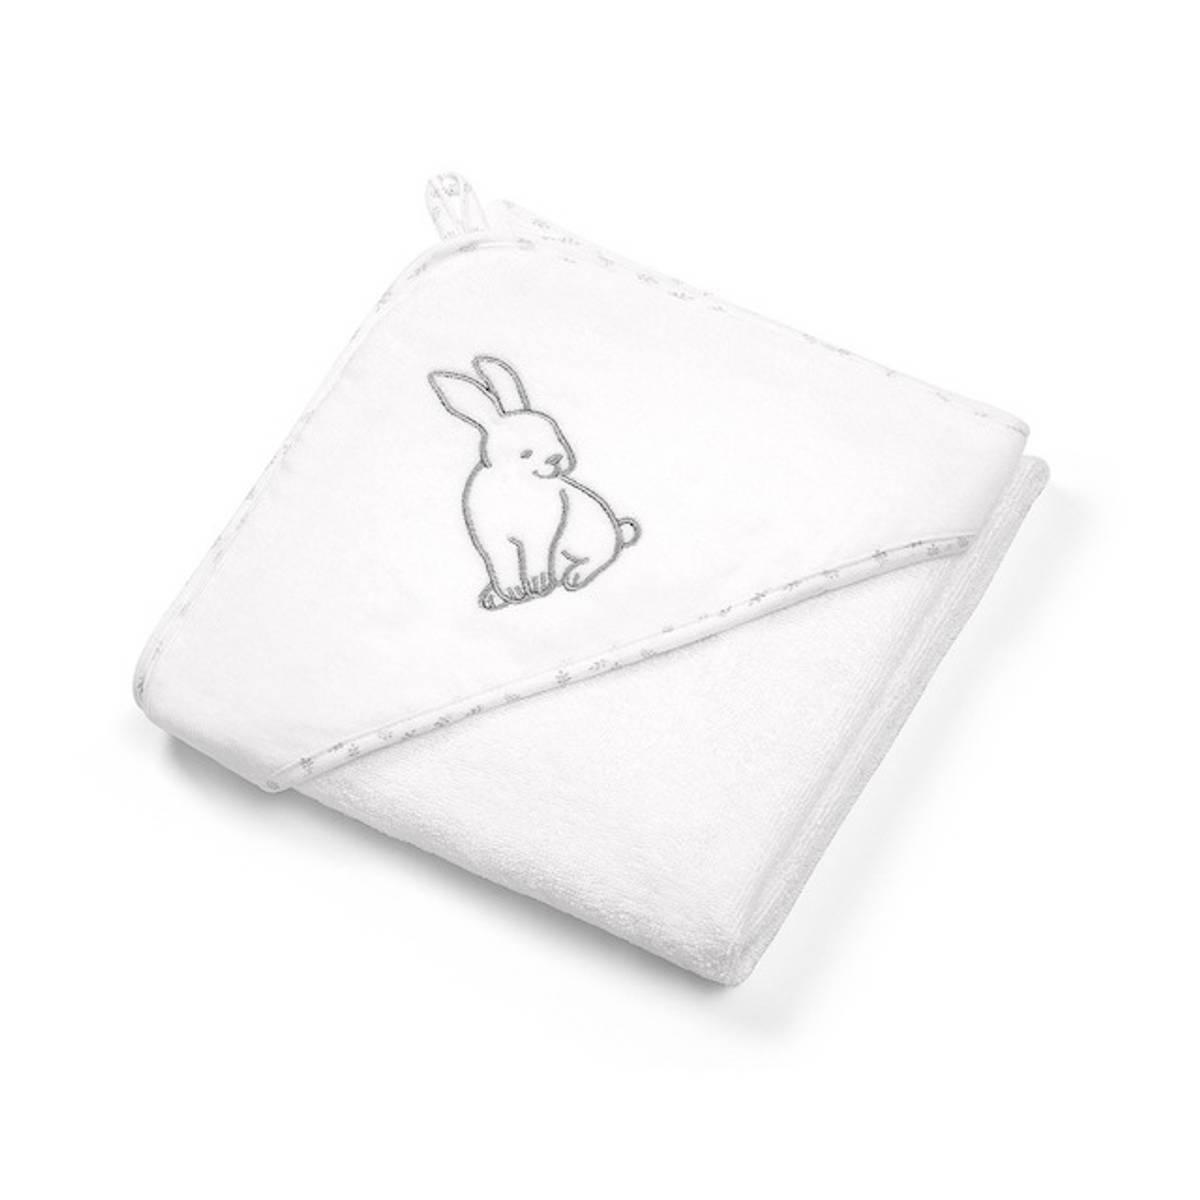 Babyono Hettehåndkle Soft Hvit 76x76 cm.